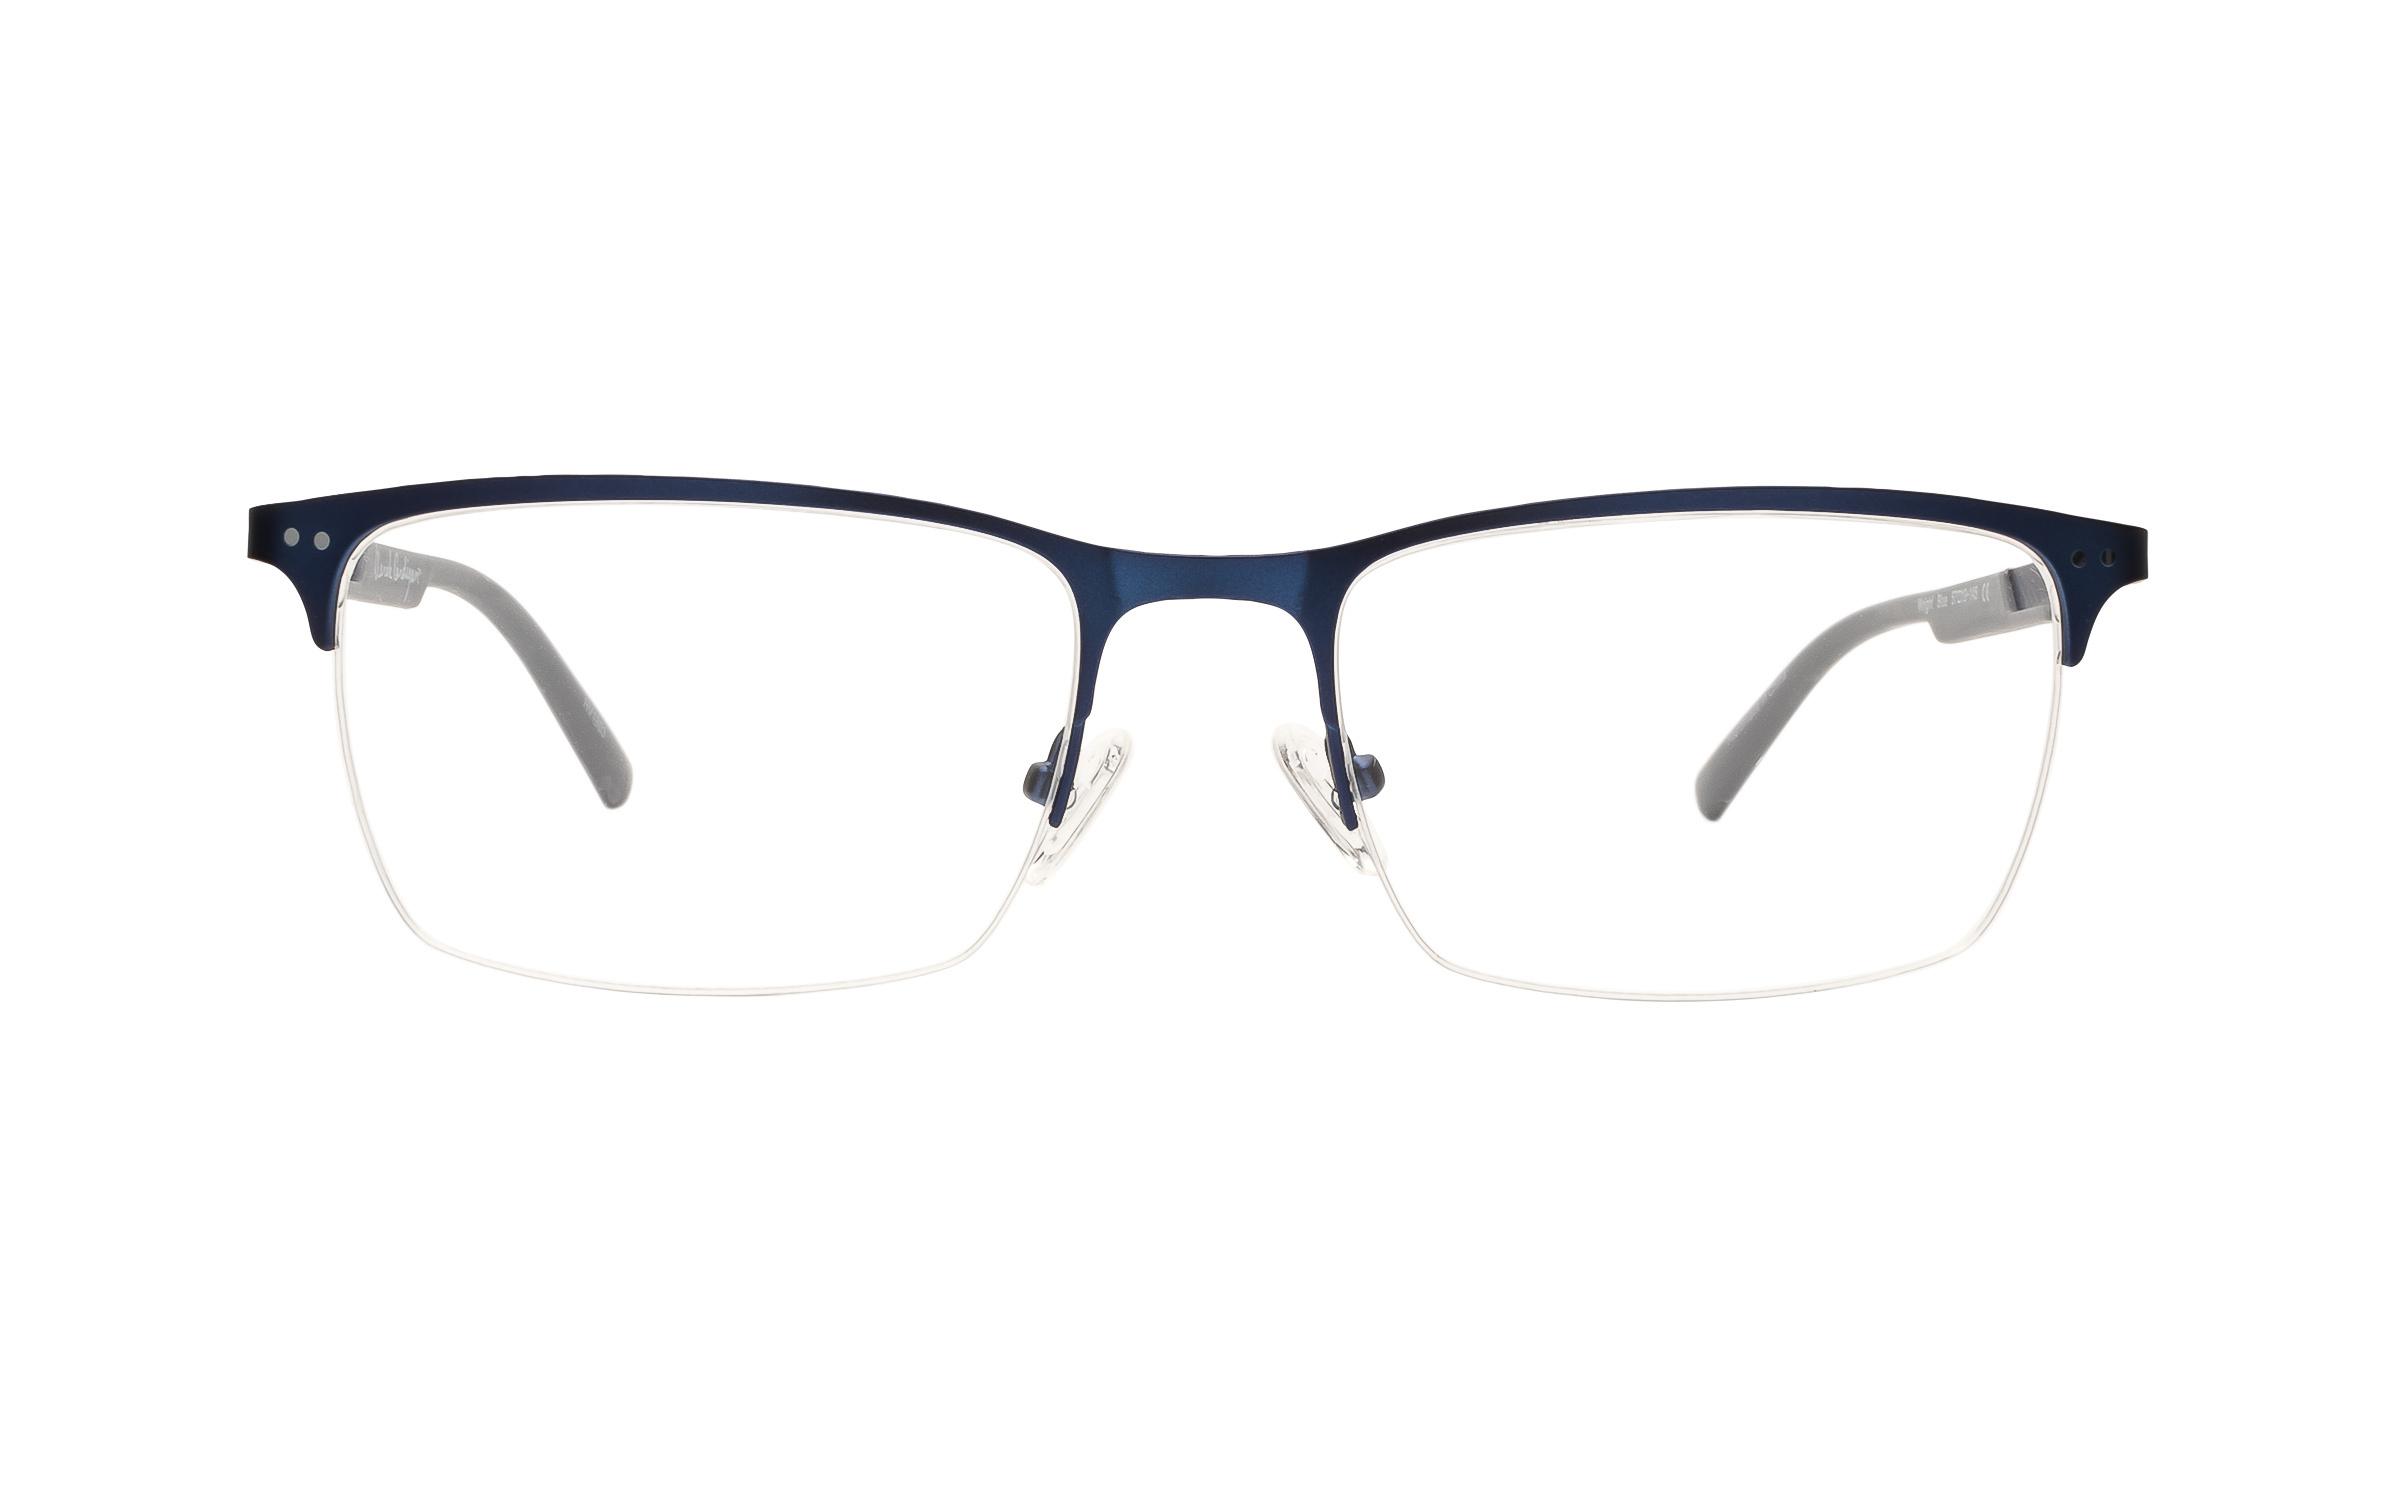 Derek_Cardigan_Mens_Glasses_Semi_Rimless_Blue_Metal_Online_Coastal